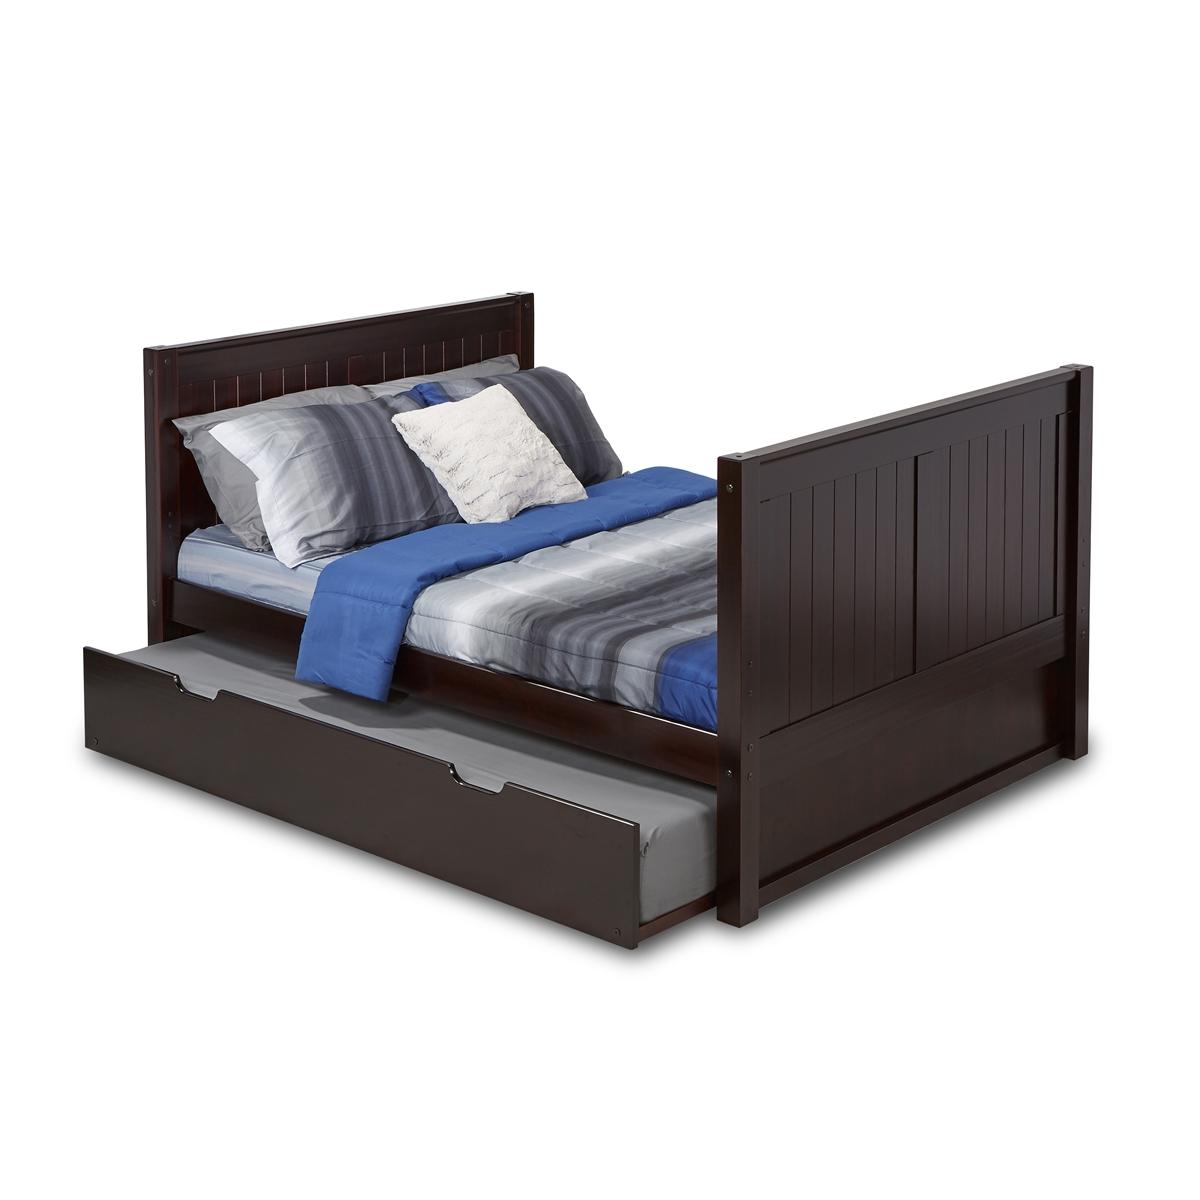 Full Size Platform Bed Tall Trundle Panel Black